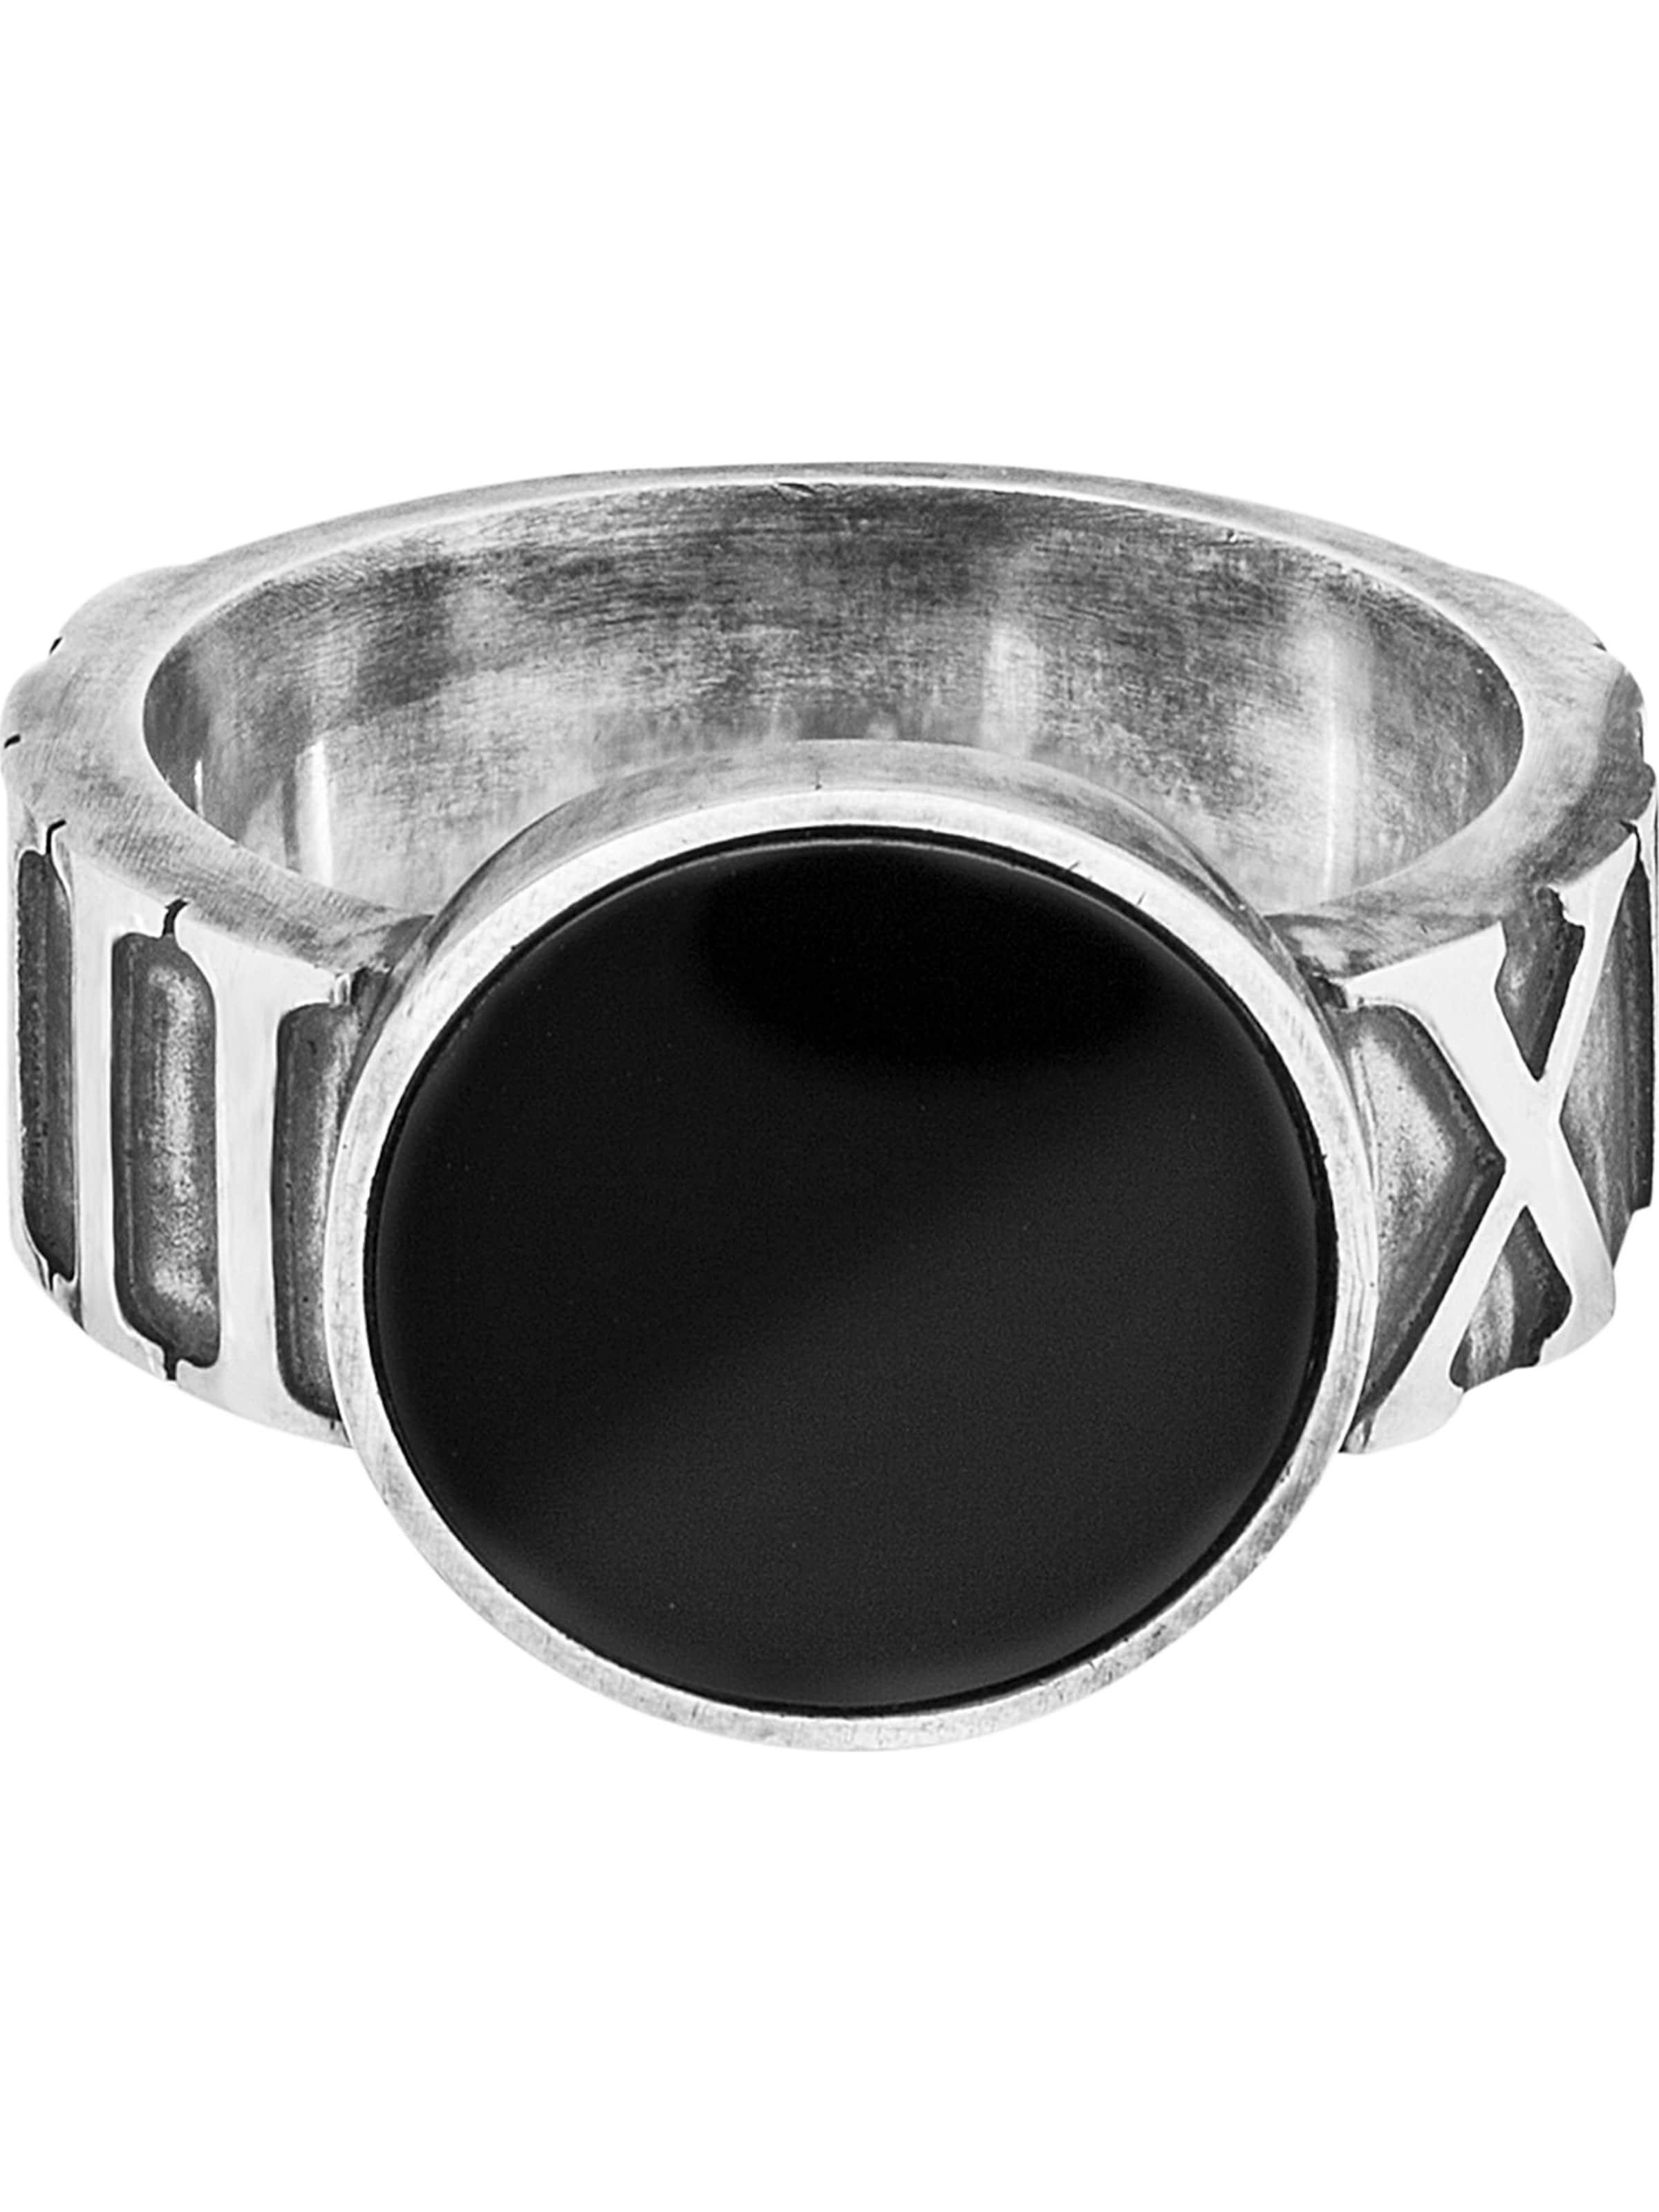 In 066' Caï Ring SchwarzSilber '132270824 kOuTlZwiPX